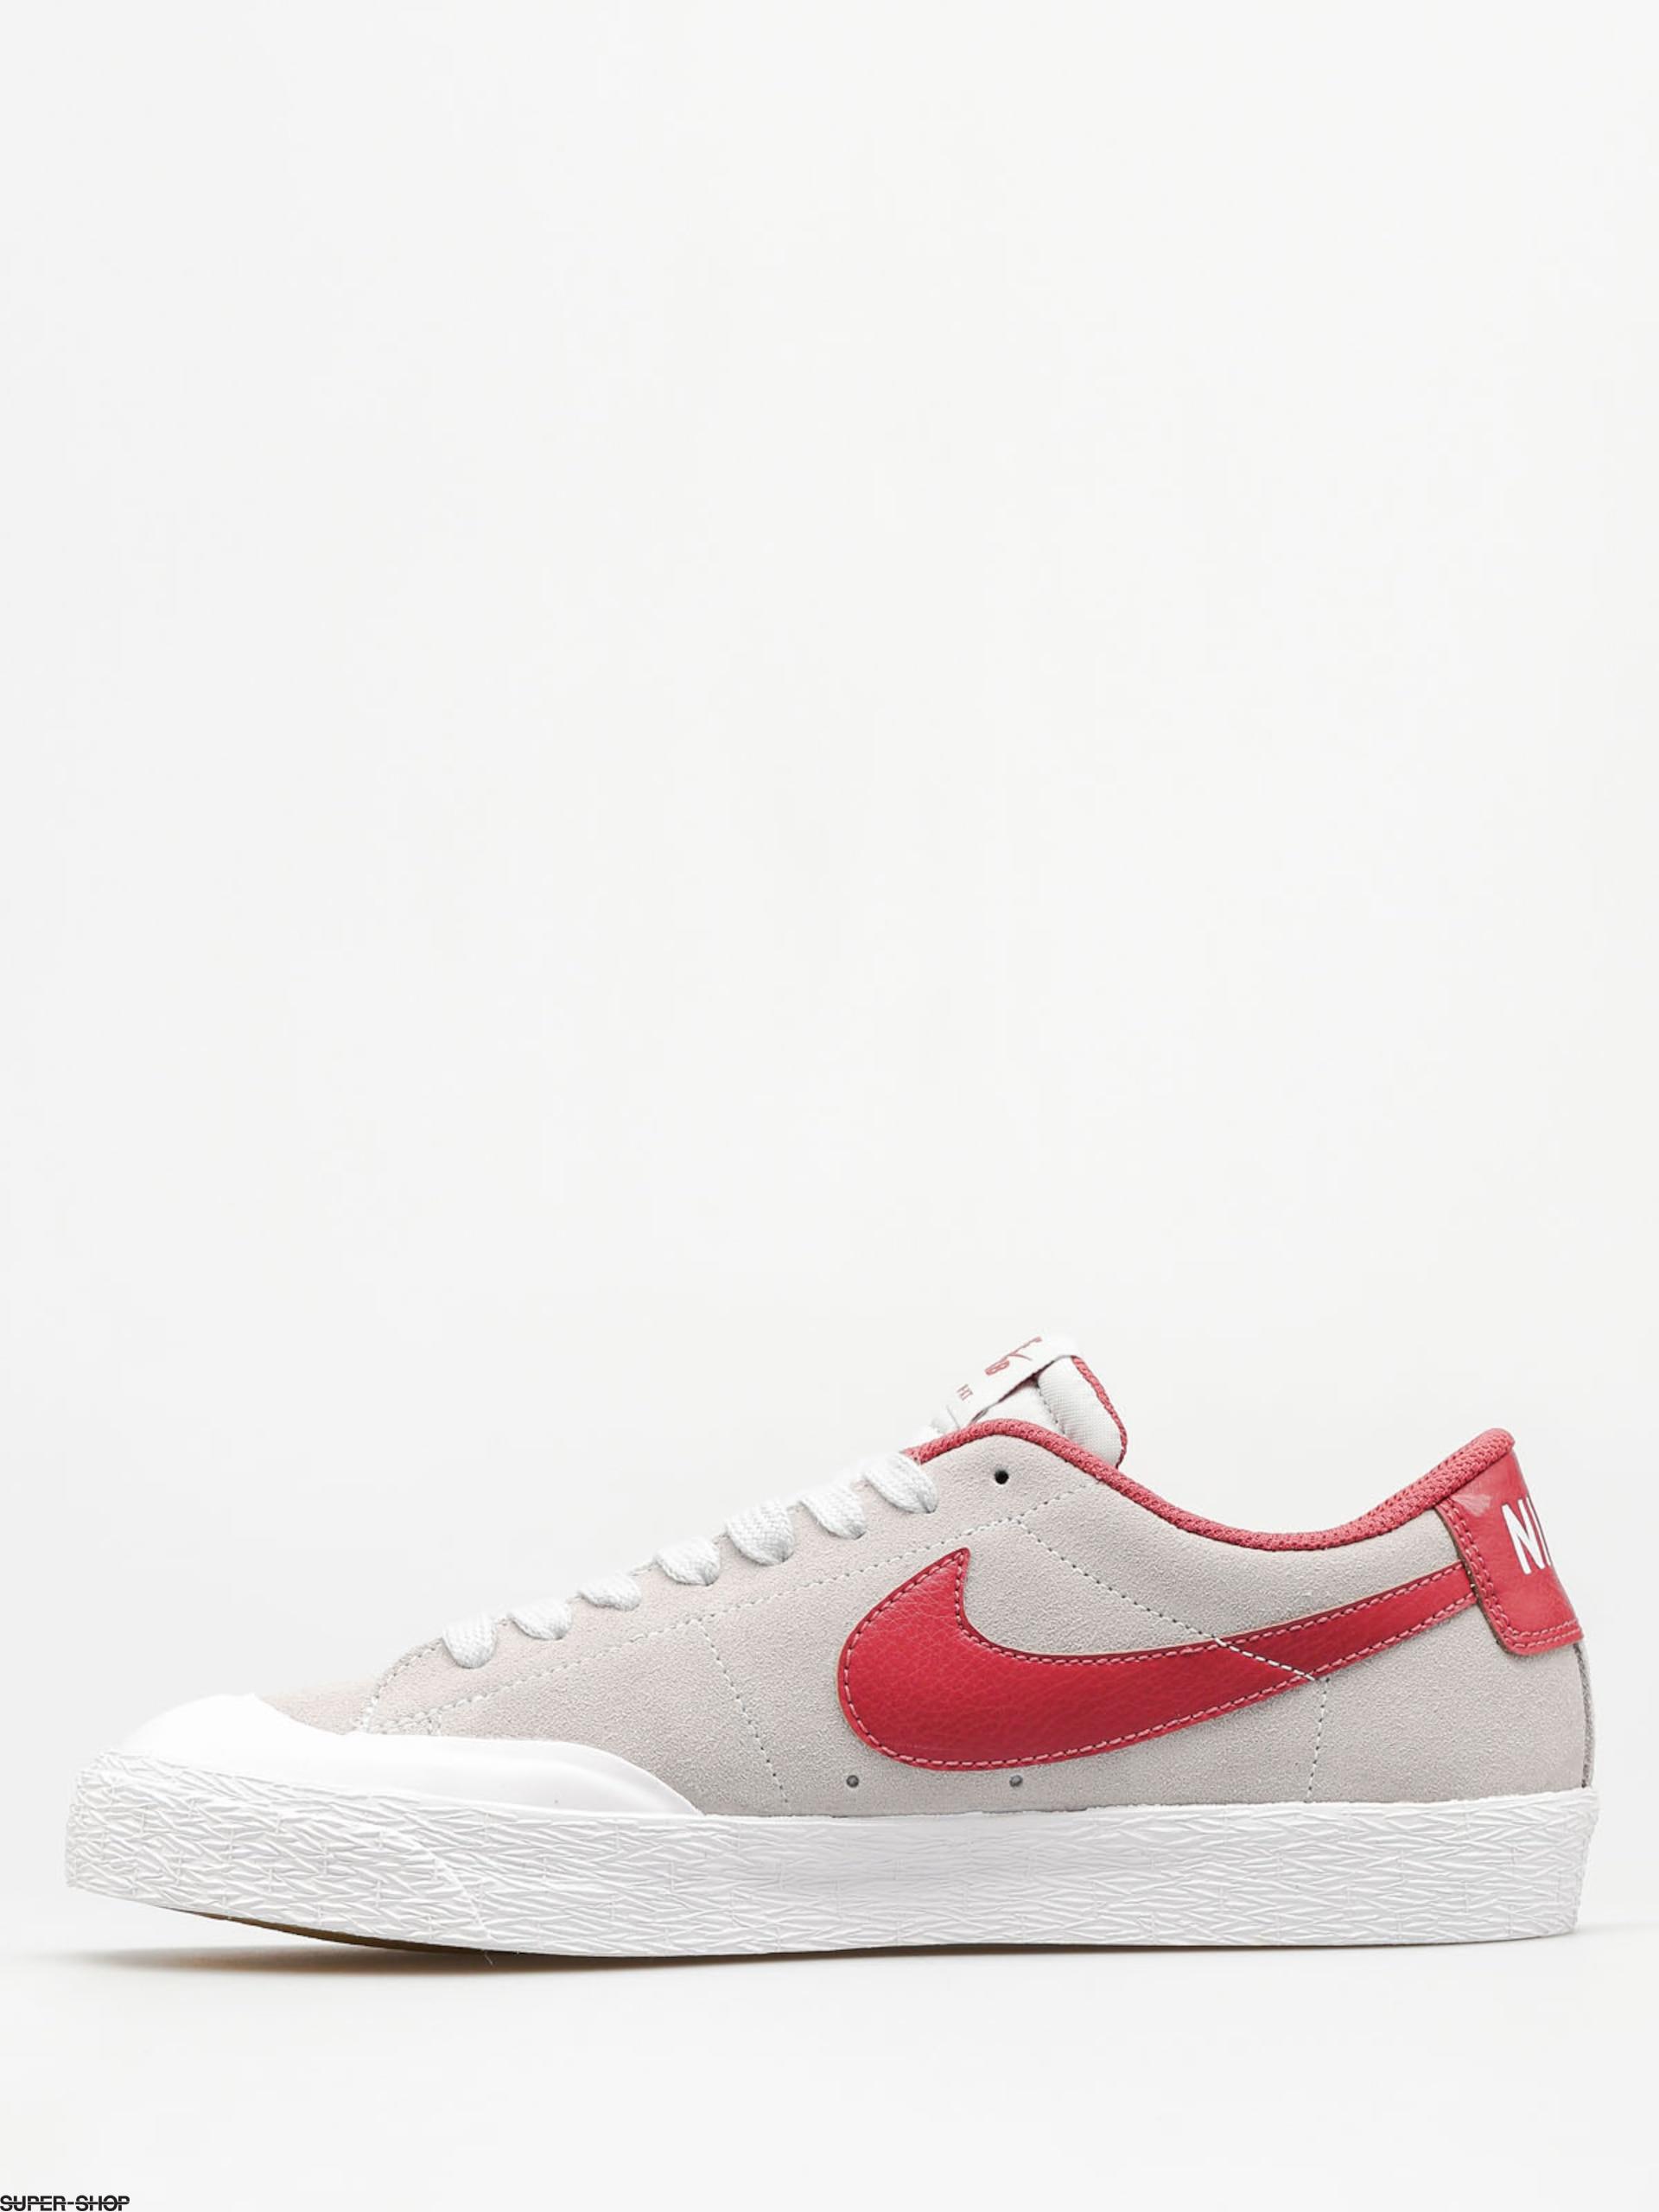 46d9d07f1150 ... new arrive 2b10b 18749 Nike SB Shoes Blazer Zoom Low Xt (pure  platinumcedar white) ...